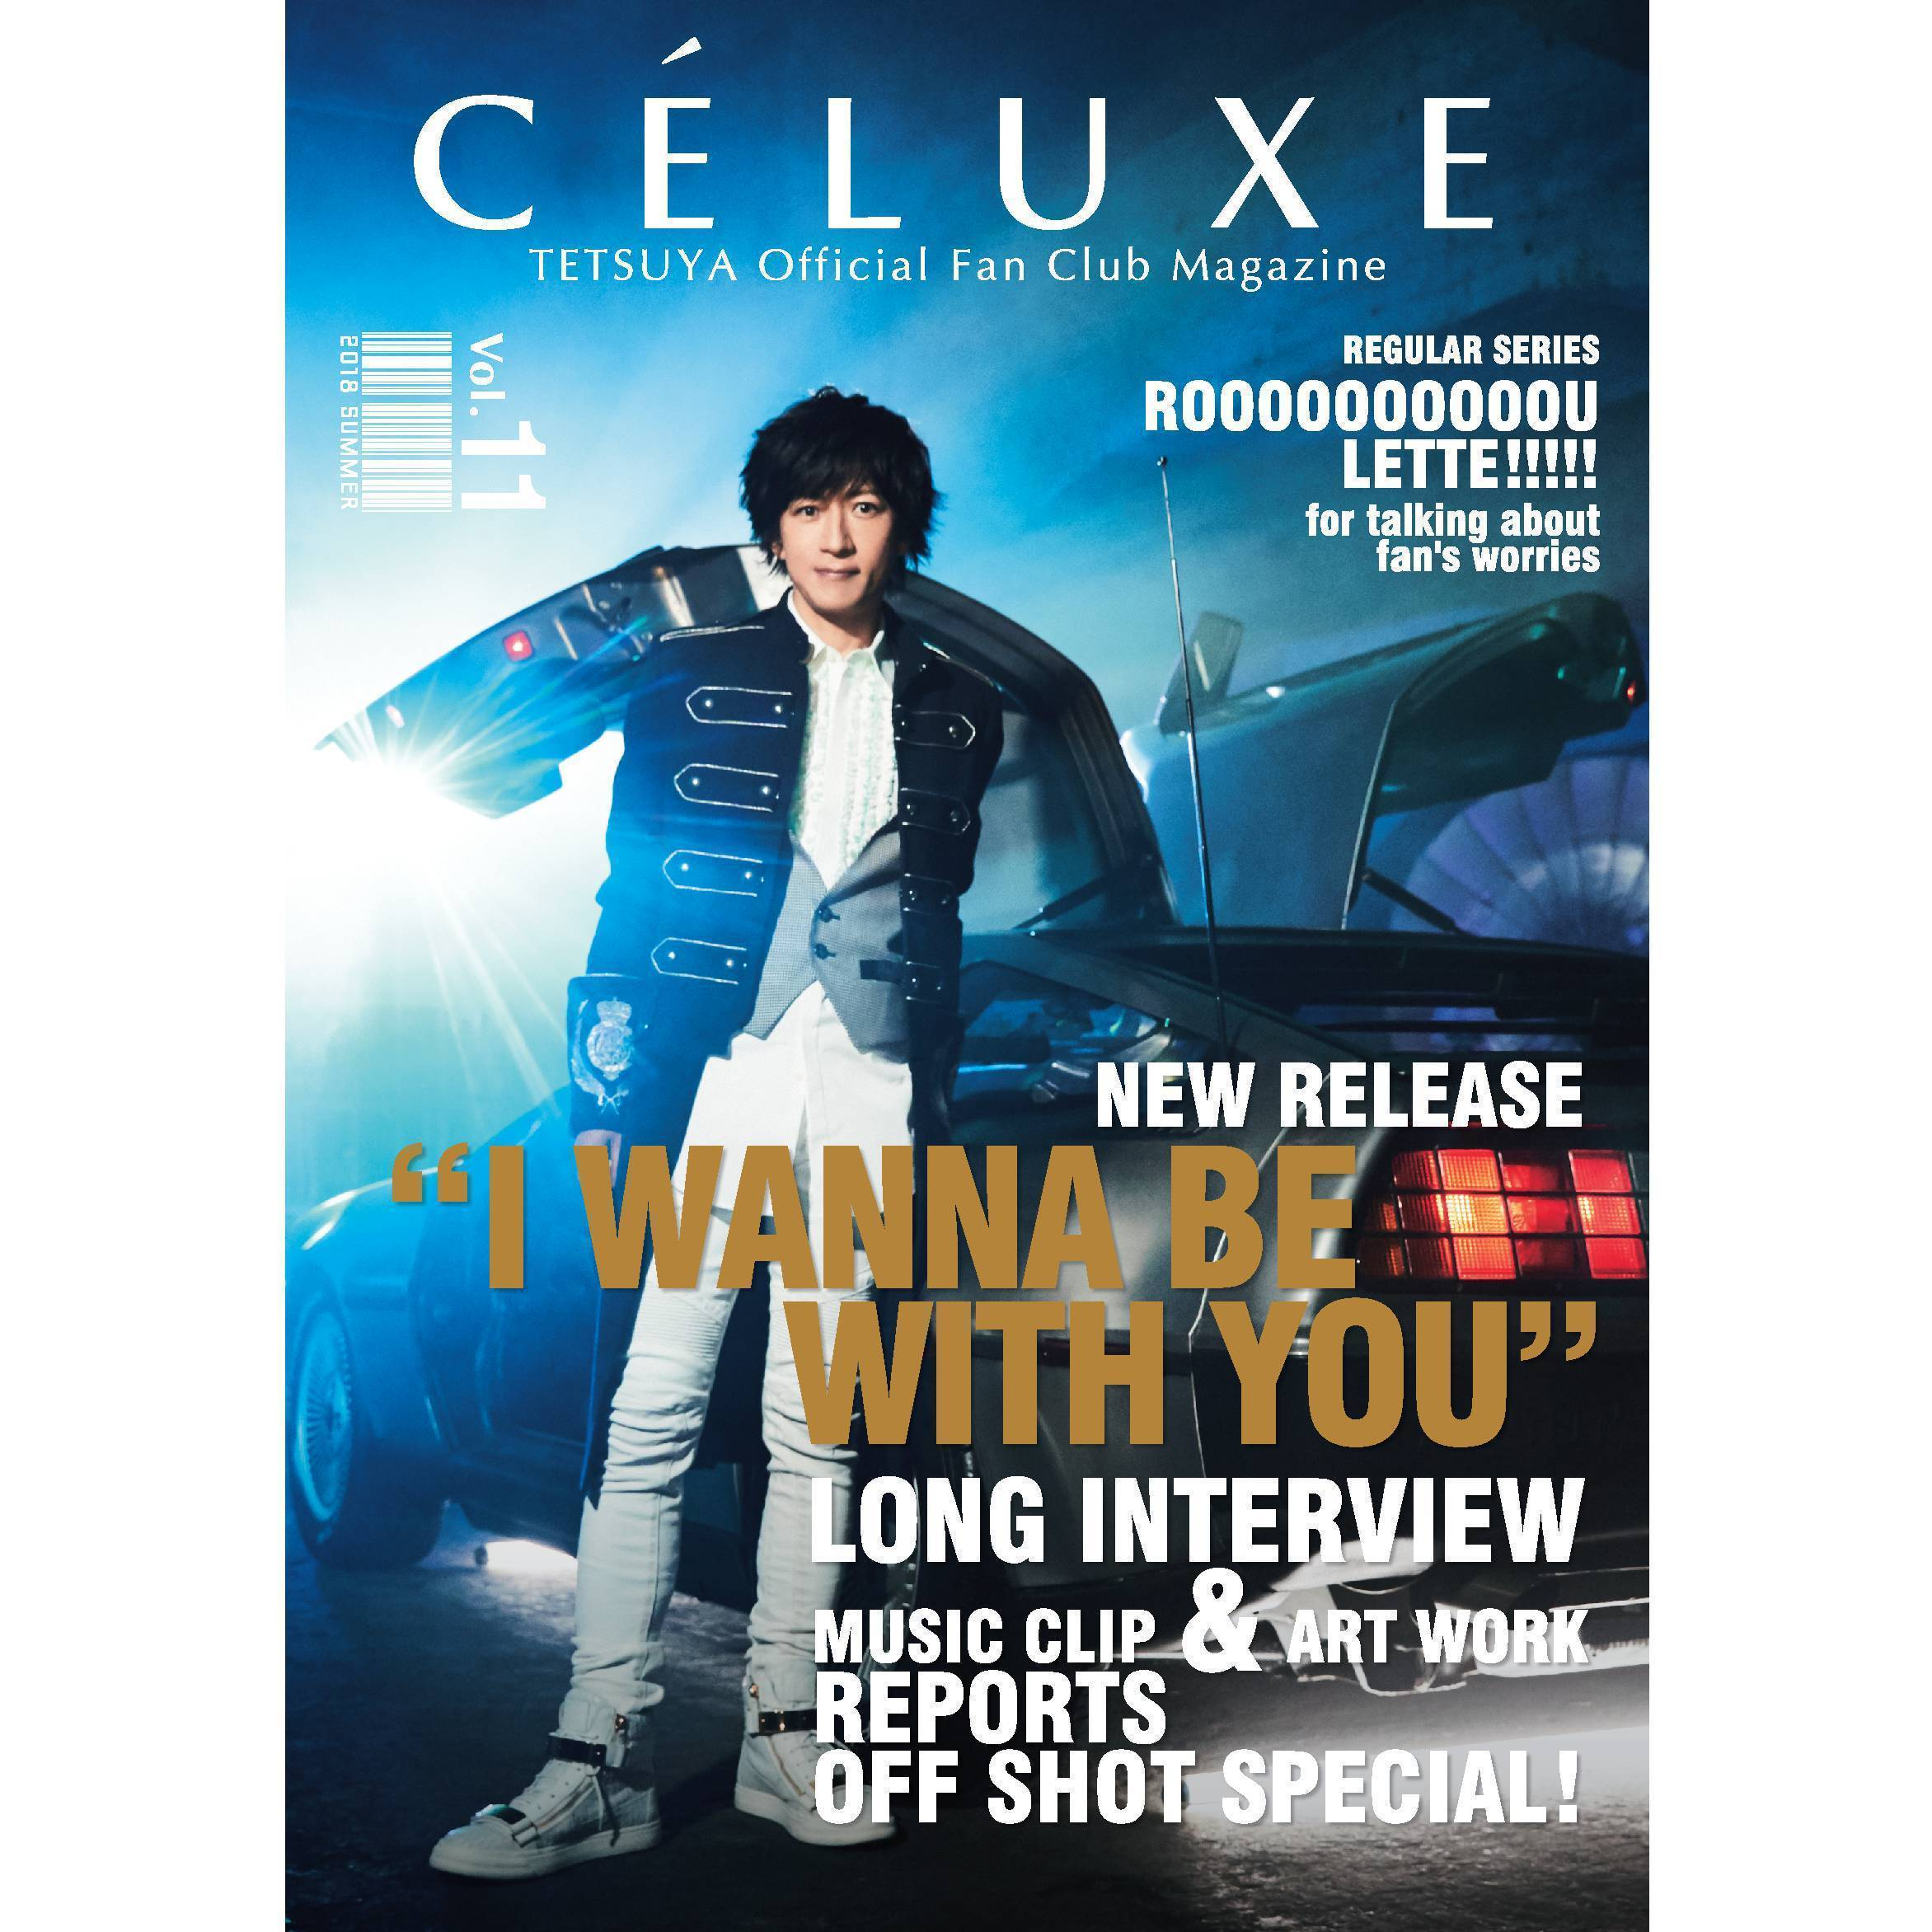 TETSUYA OFFICIAL FANCLUB「CÉLUXE」会報誌 Vol.11